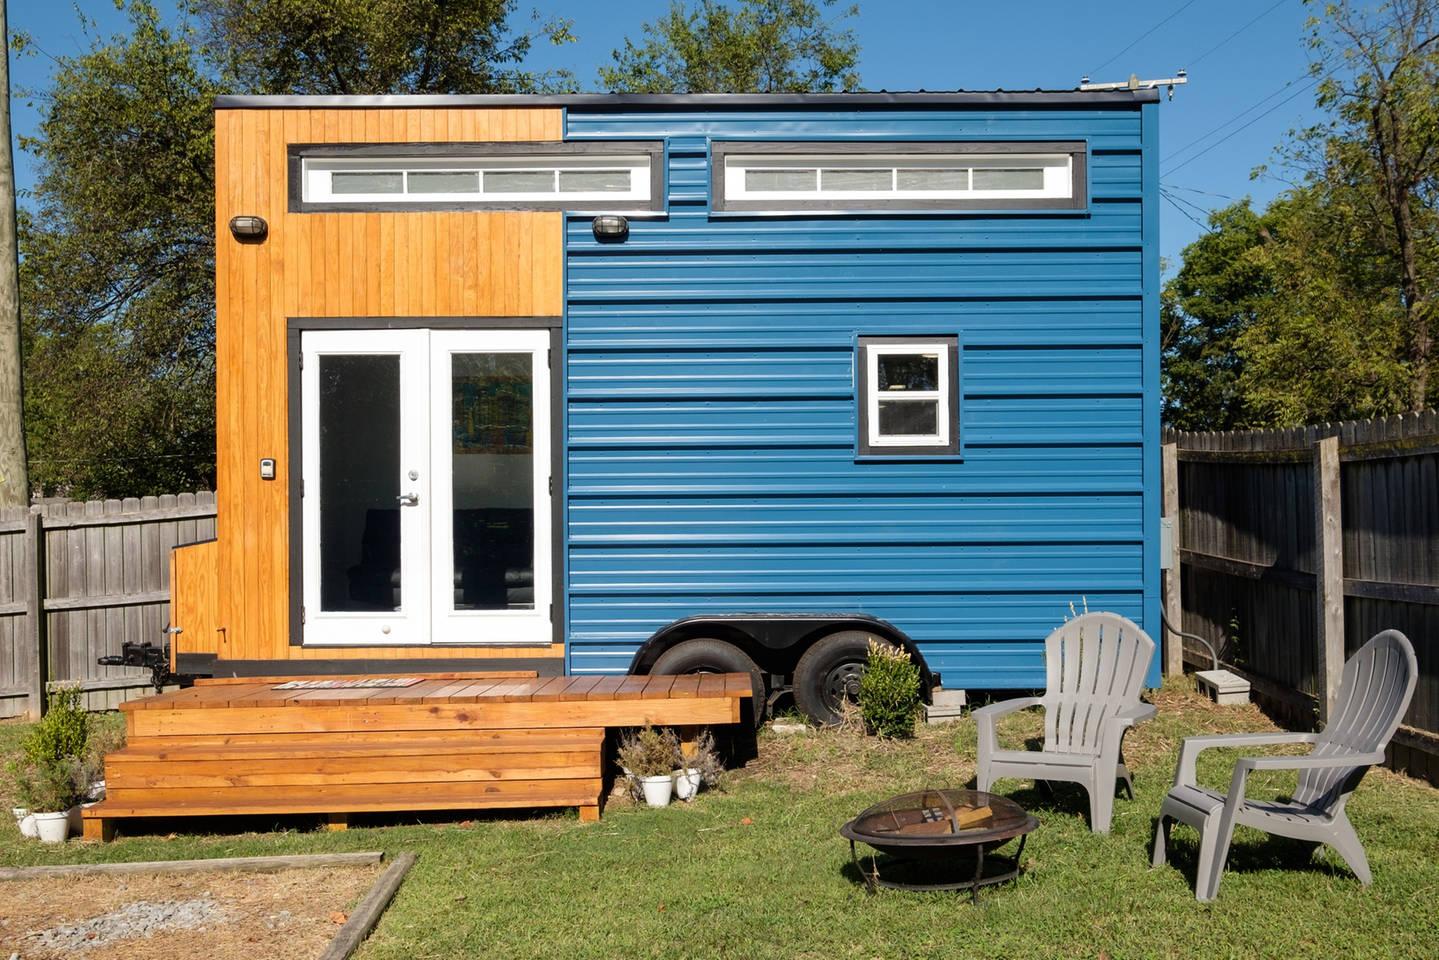 Nashville Tiny House